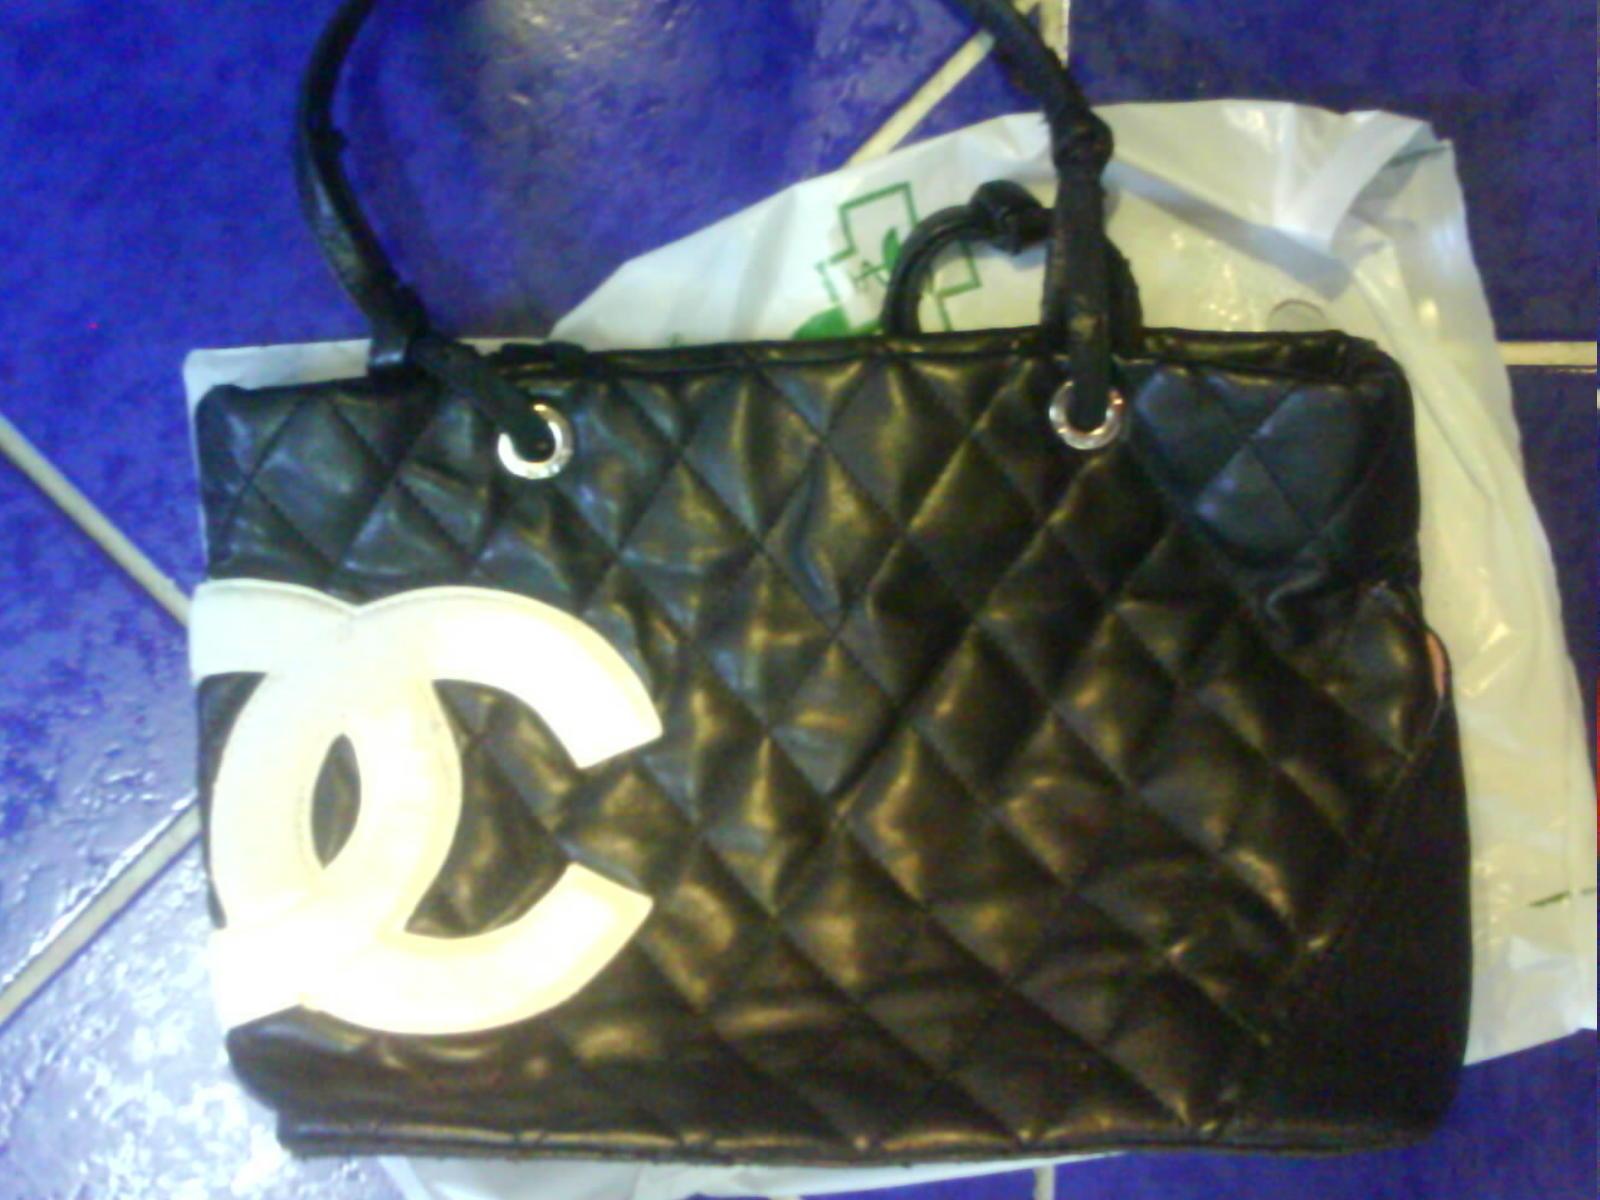 c465ae68e822 buy chanel le boy handbags for men chanel 1115 handbags